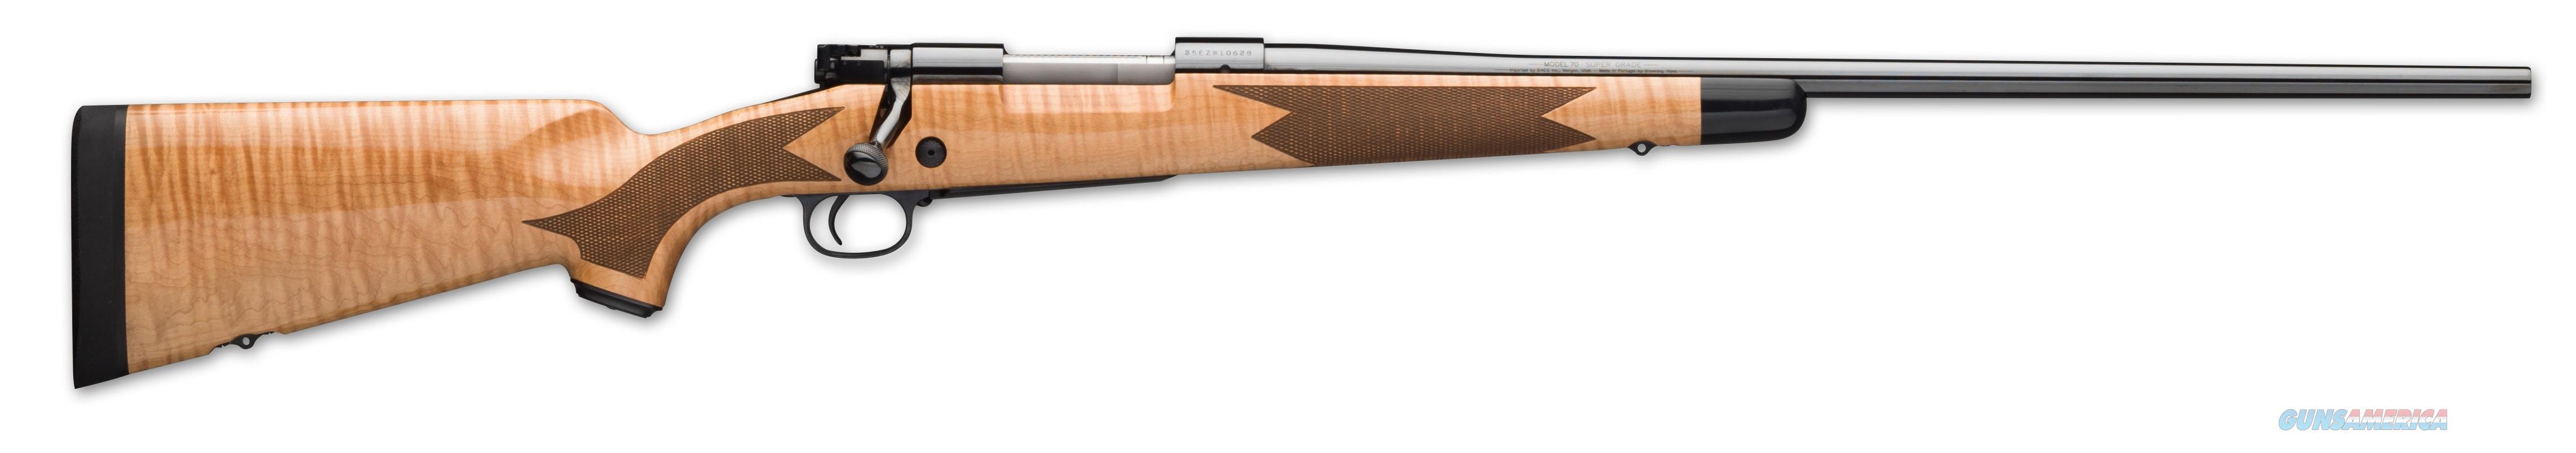 "Winchester 70 Super Grade Maple .308 Win 22"" 5 Rds 535218220   Guns > Rifles > Winchester Rifles - Modern Bolt/Auto/Single > Model 70 > Post-64"